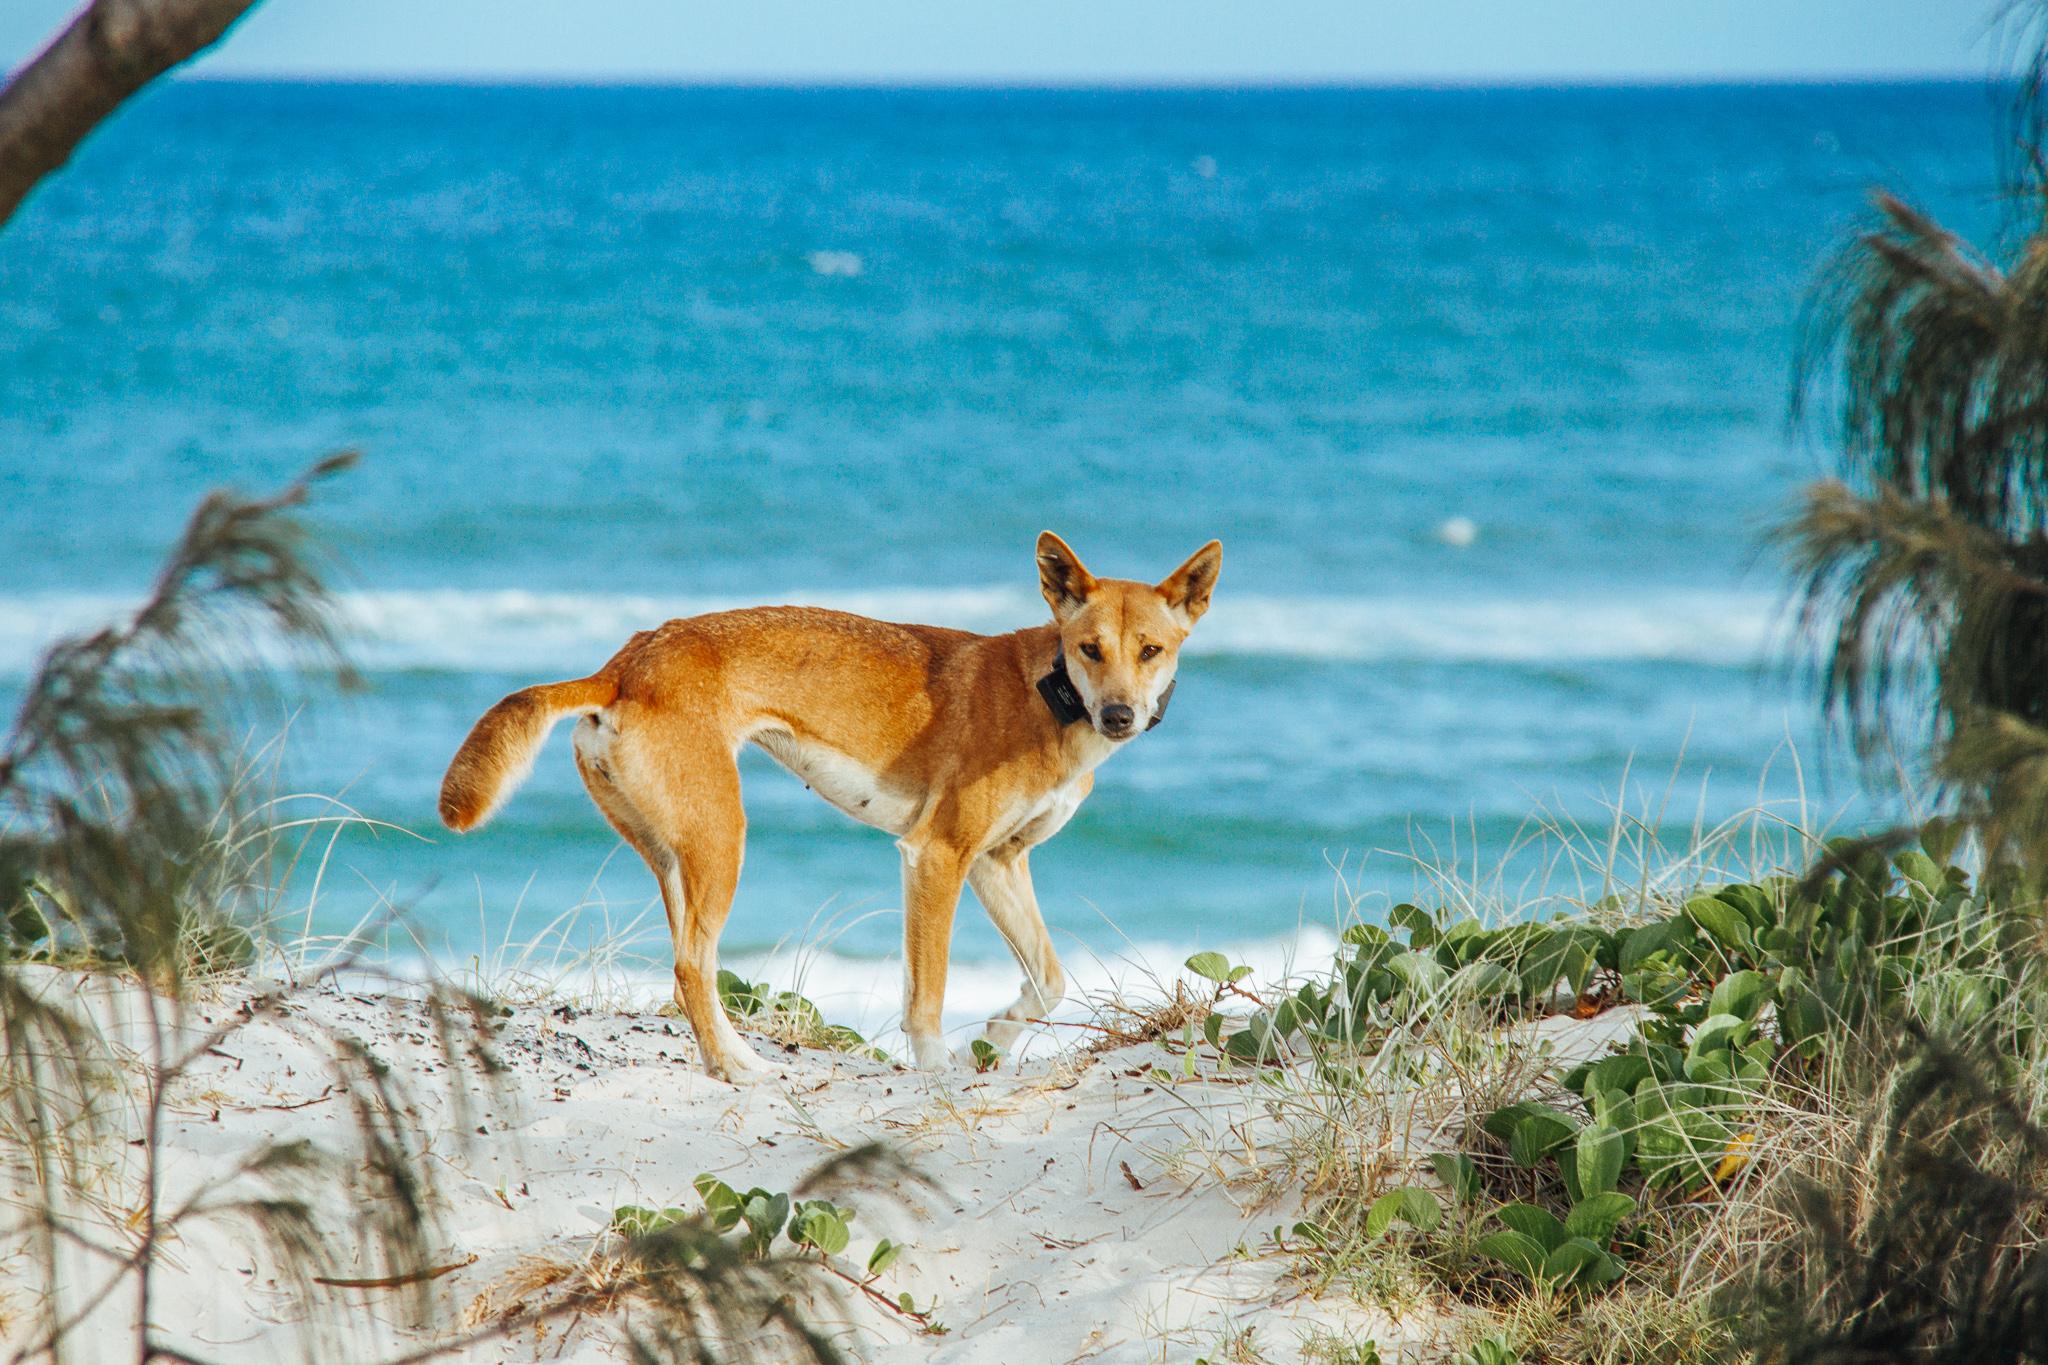 Dingo by Beach Fraser Island Queensland Australia